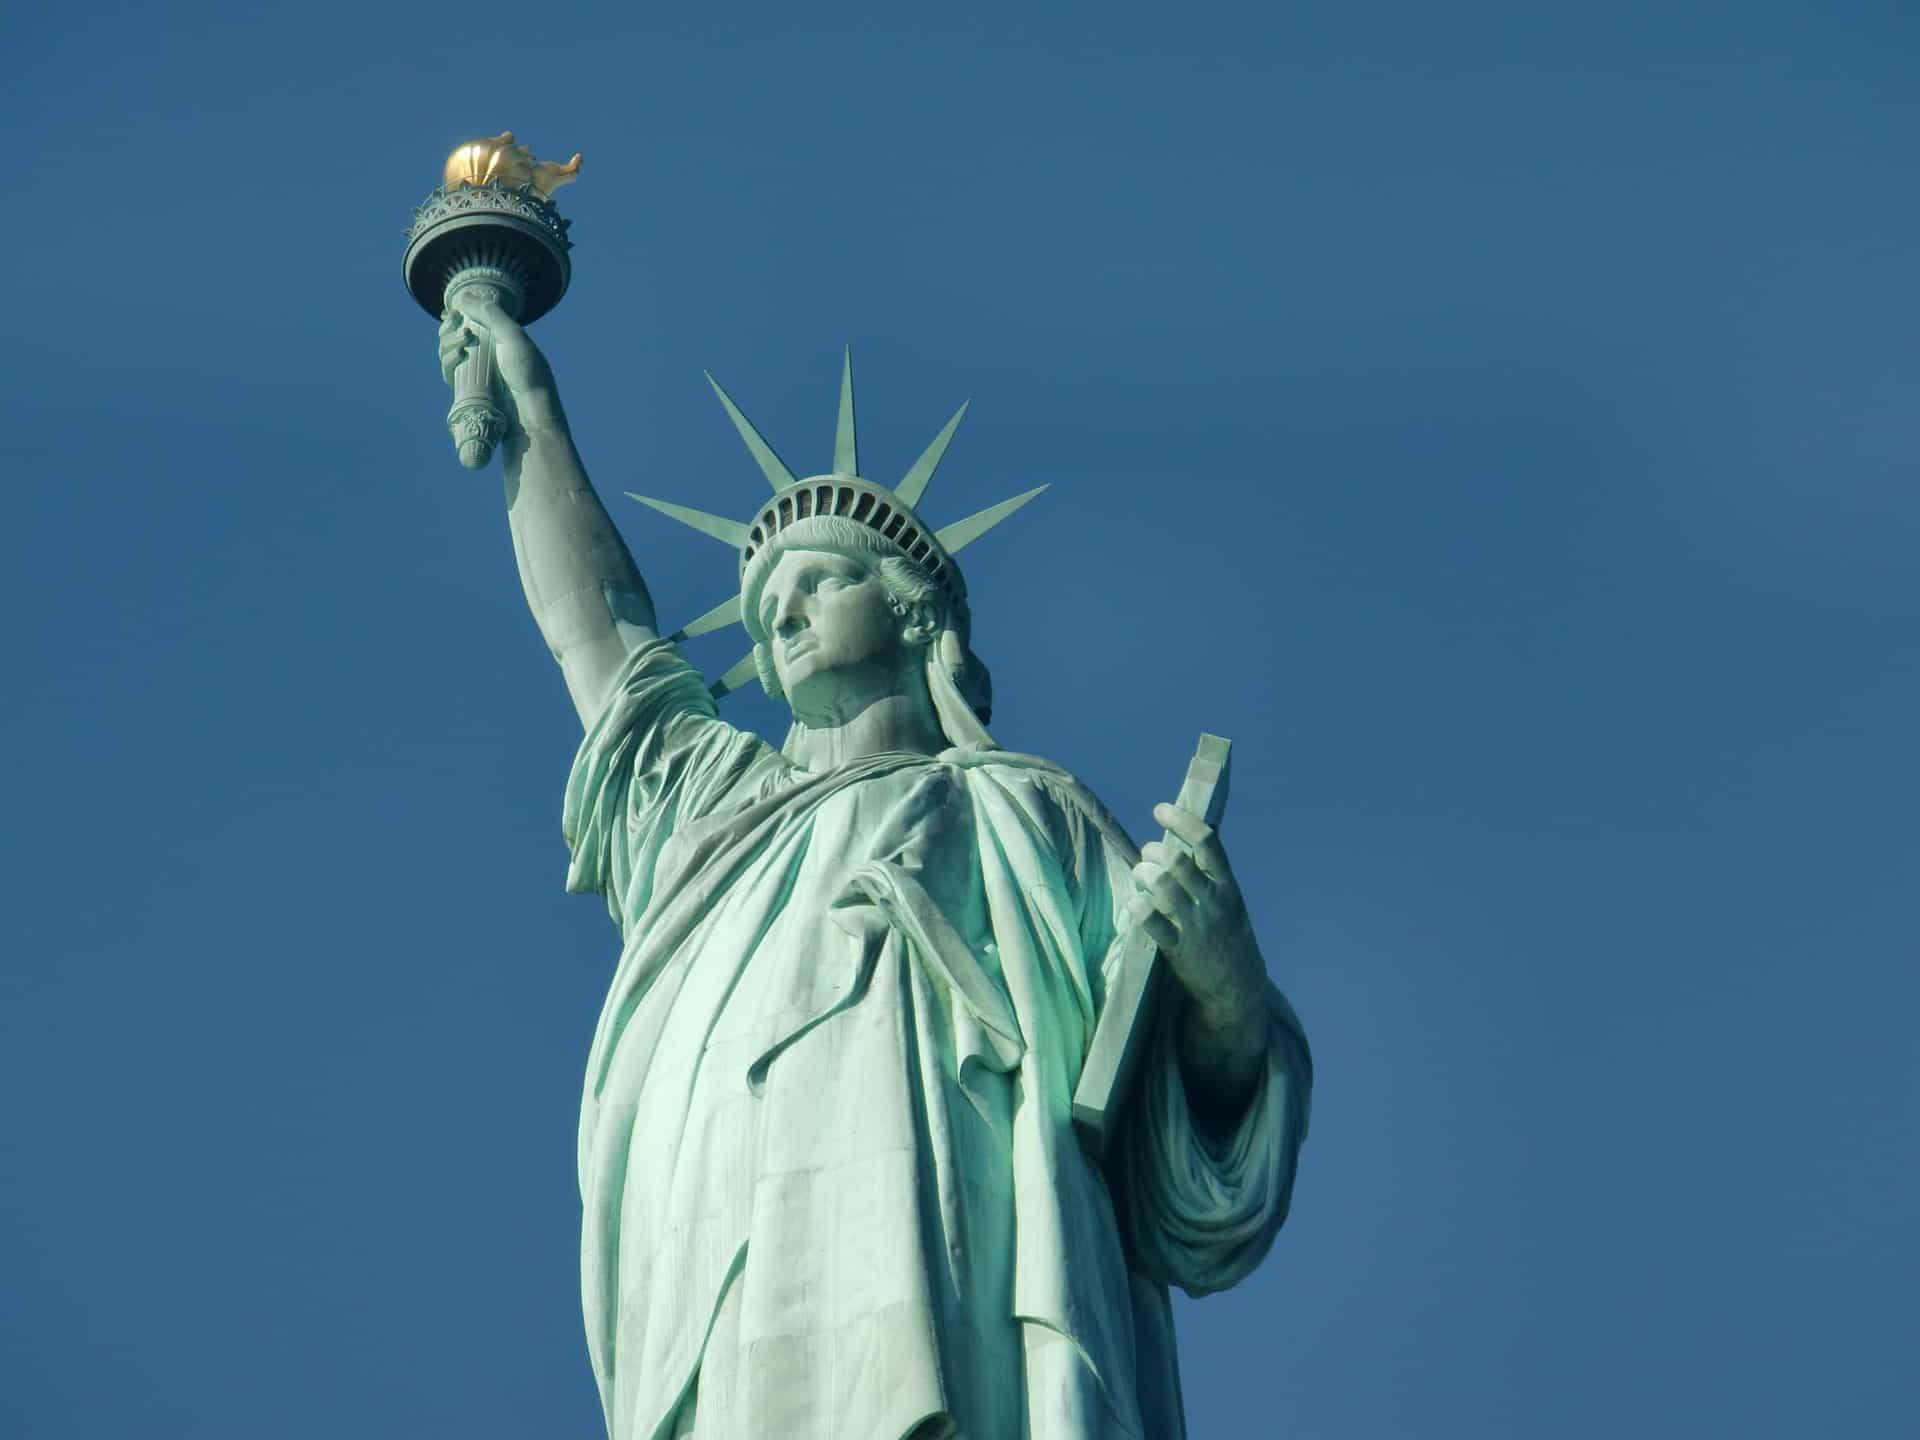 statue-of-liberty-271430_1920